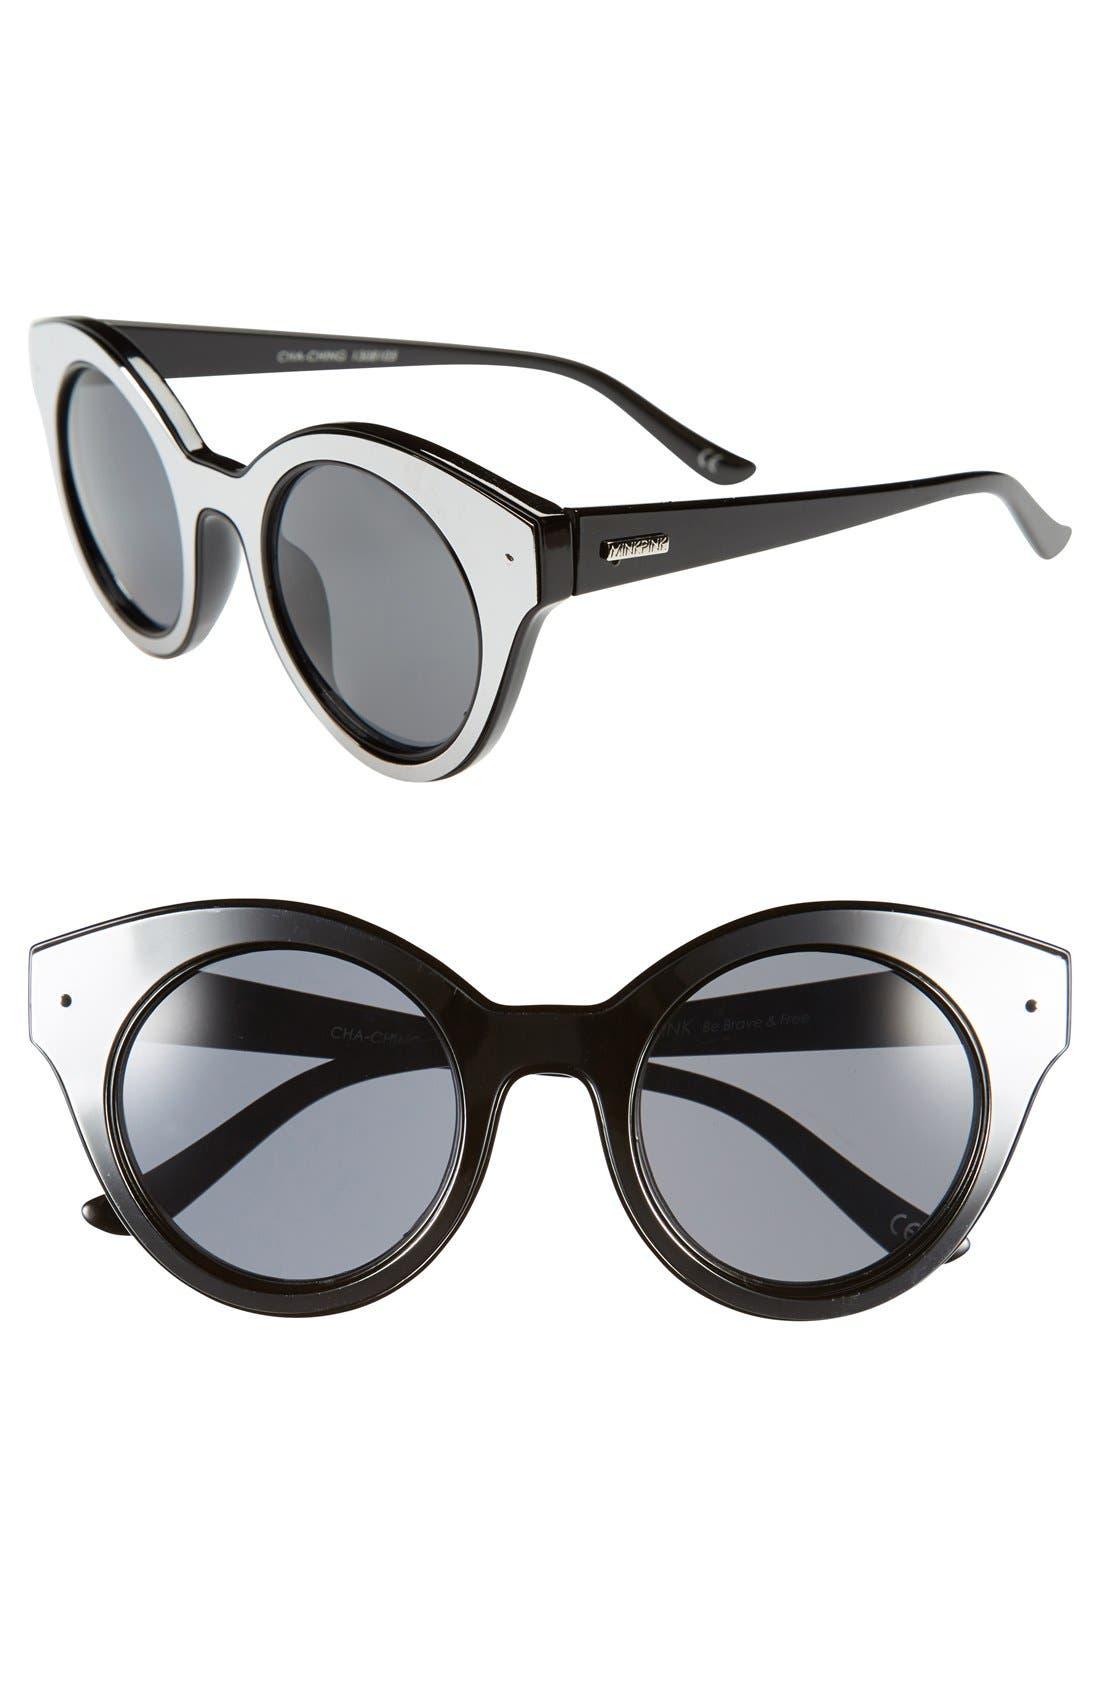 Main Image - MINKPINK 'Cah Ching' 47mm Sunglasses